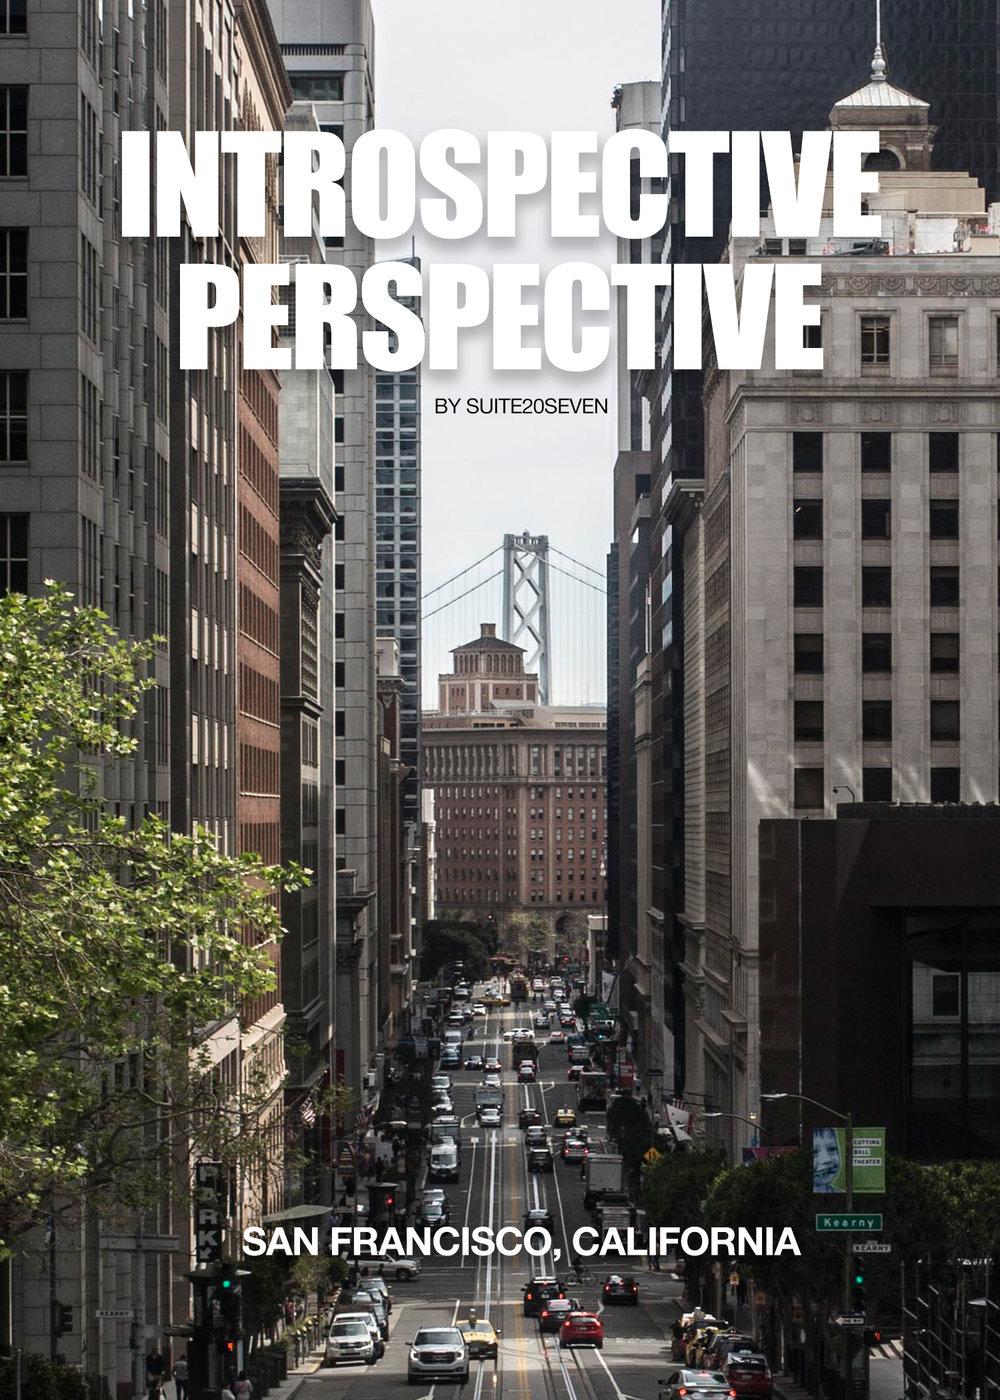 introspective_respectivefrontcover (1).jpg